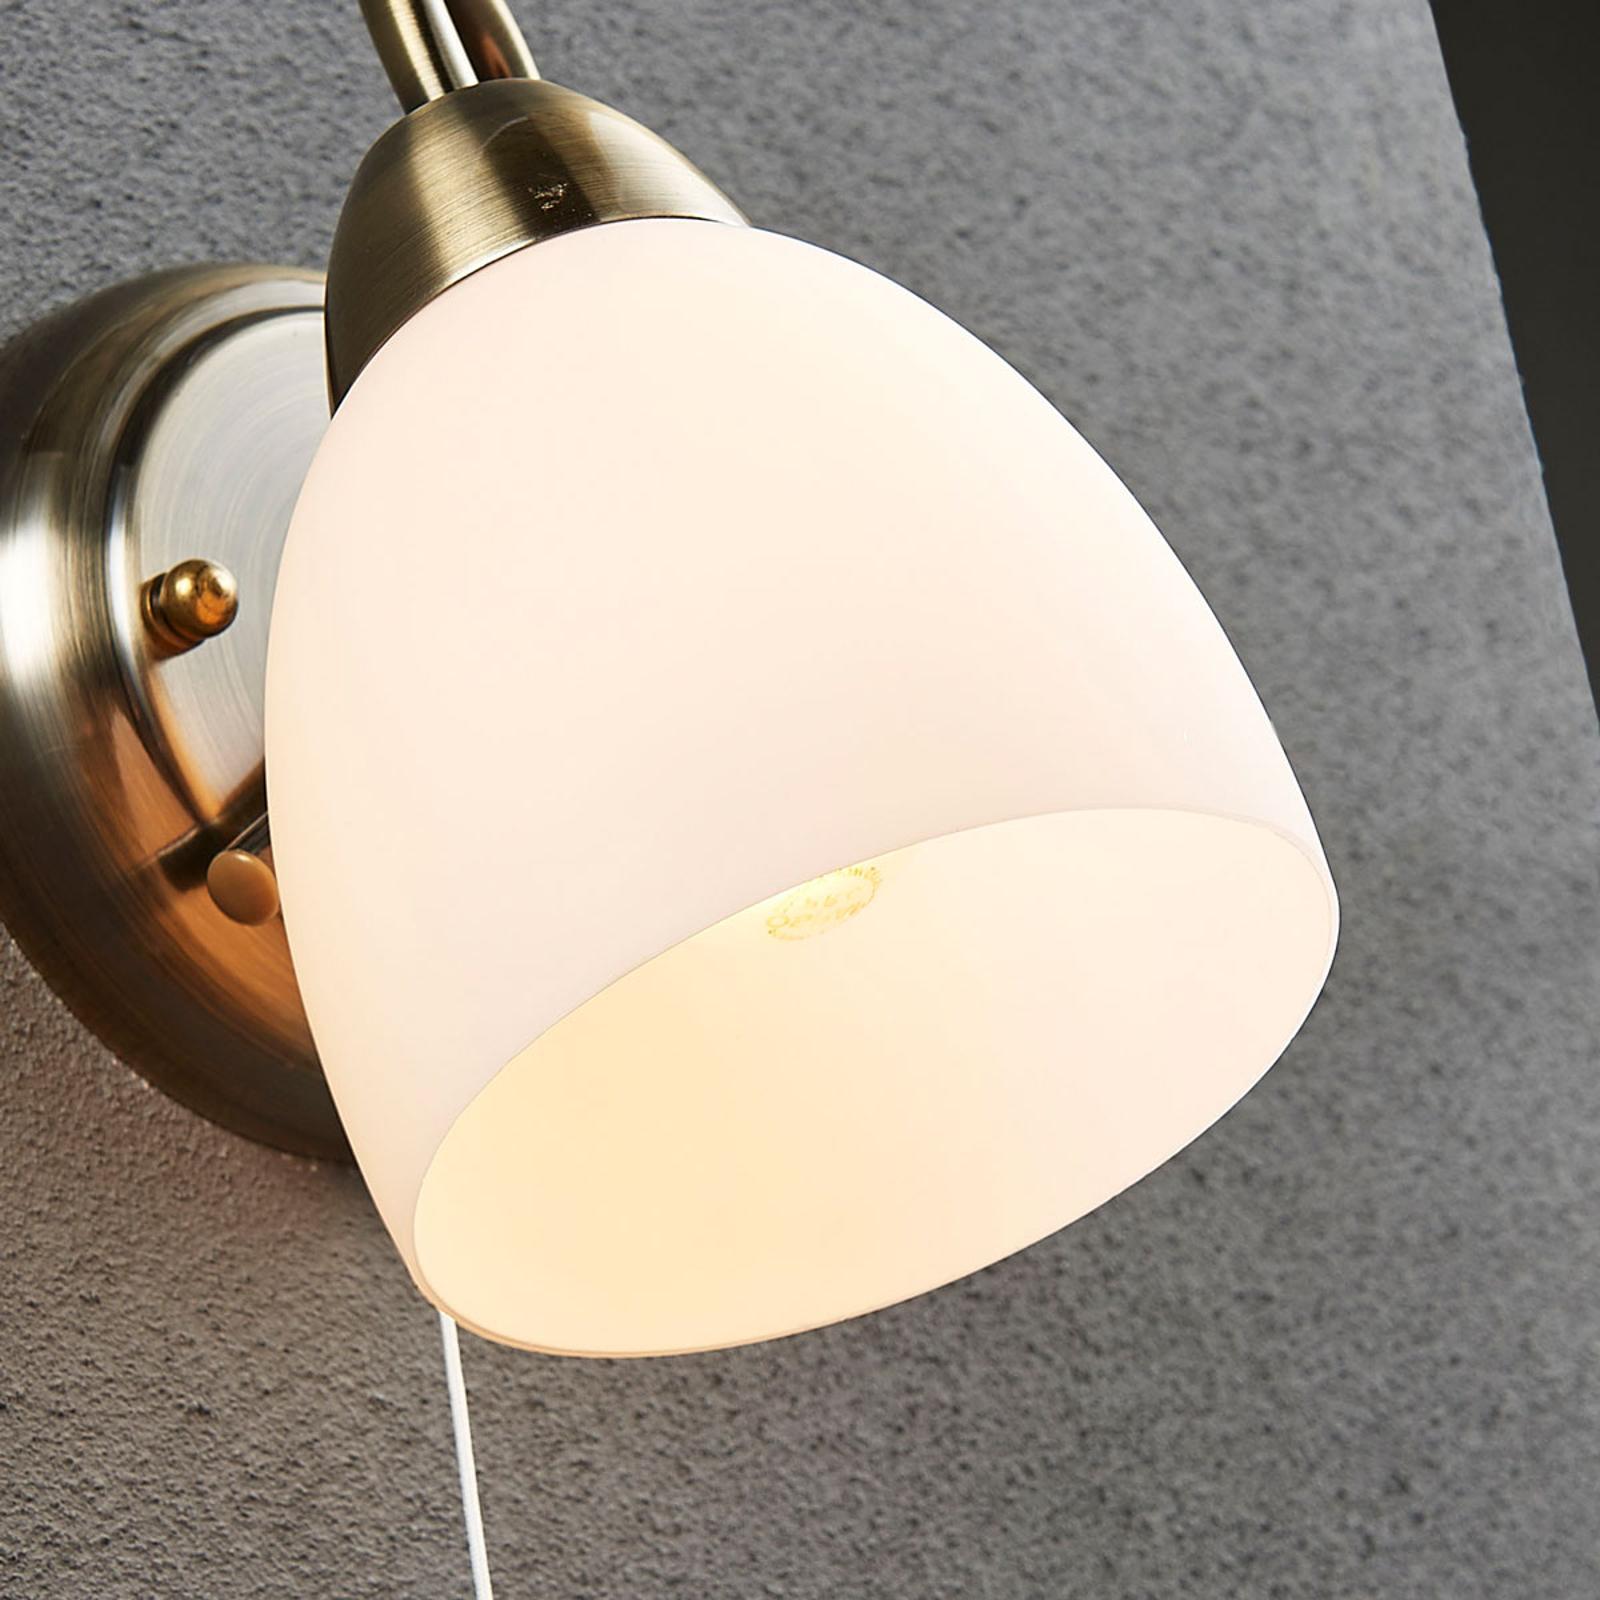 Wandleuchte Mael Altmessing Glas Weiß Wandlampe Zugschalter Lampenwelt Flur